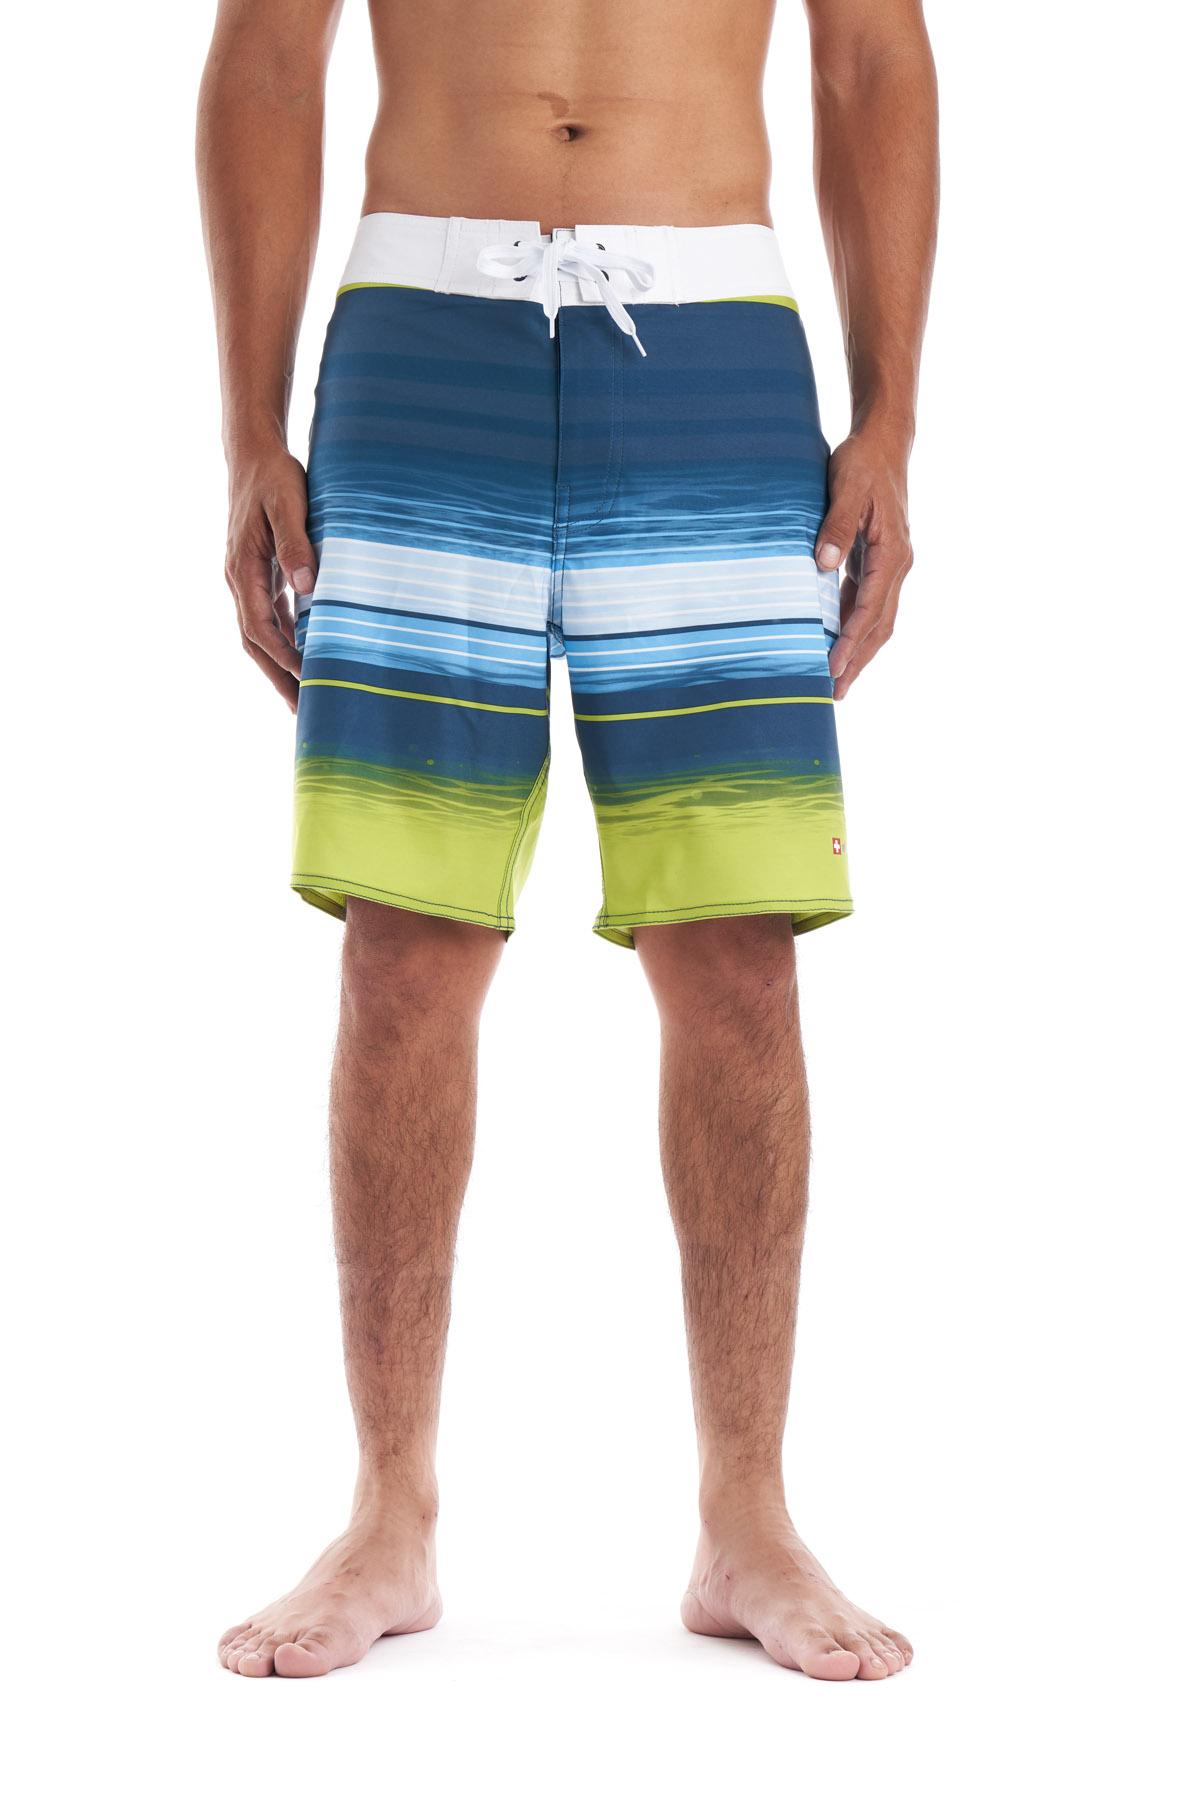 Mens Swimwear Walmartcom